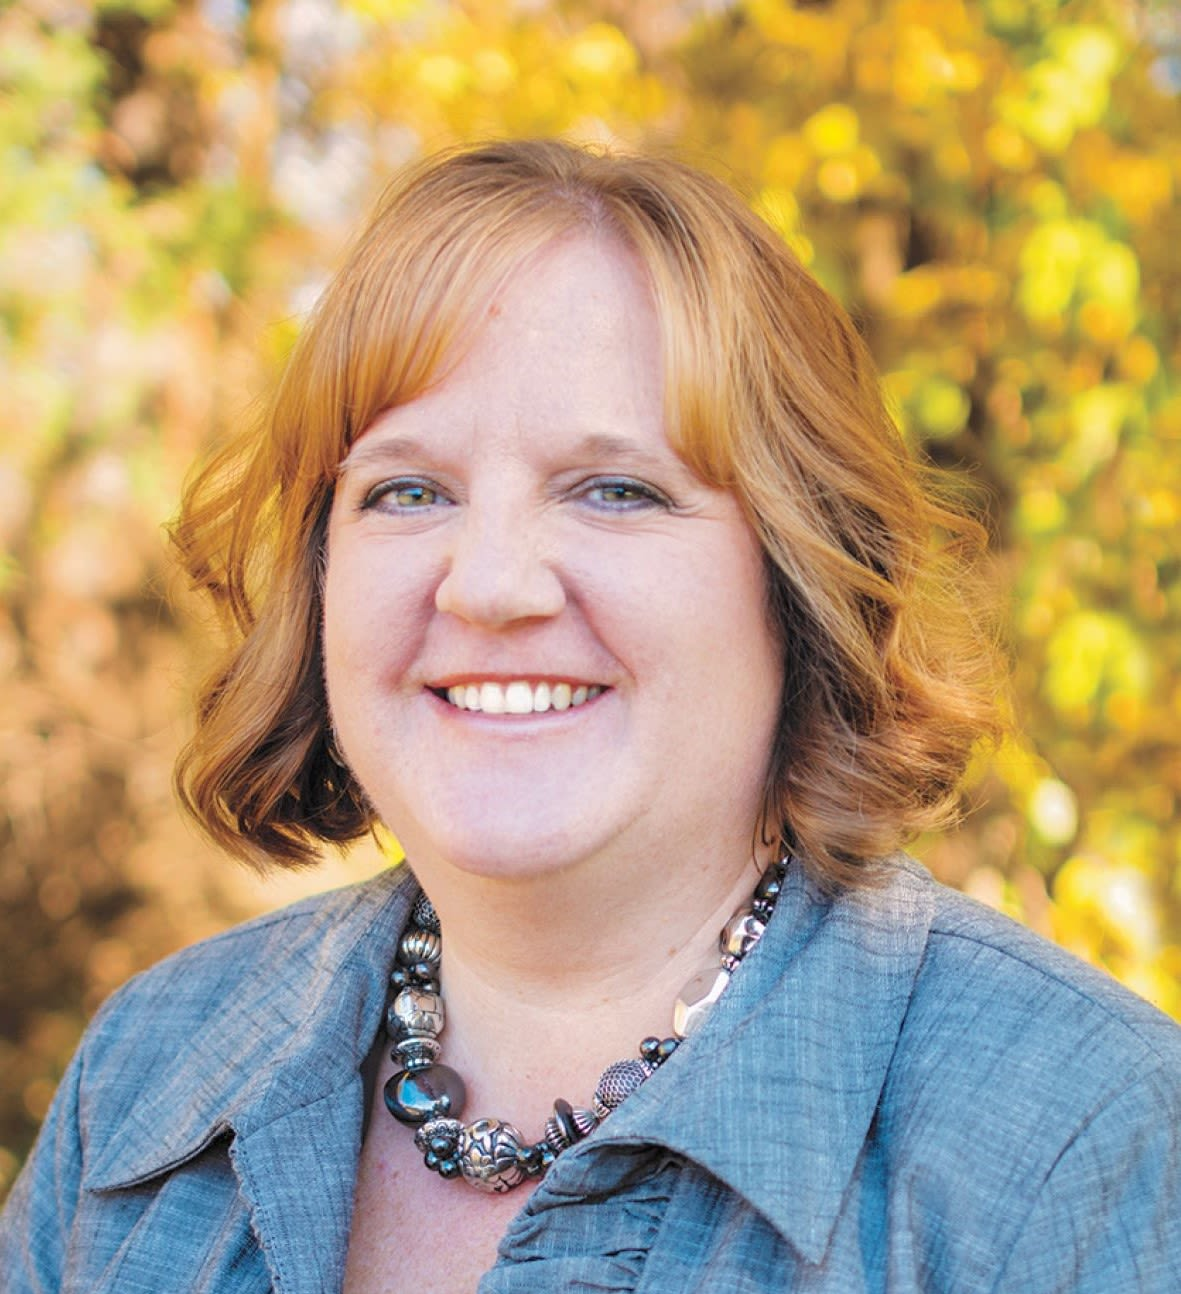 Jill Pride, Executive Director at White Oaks in Lawton, Michigan